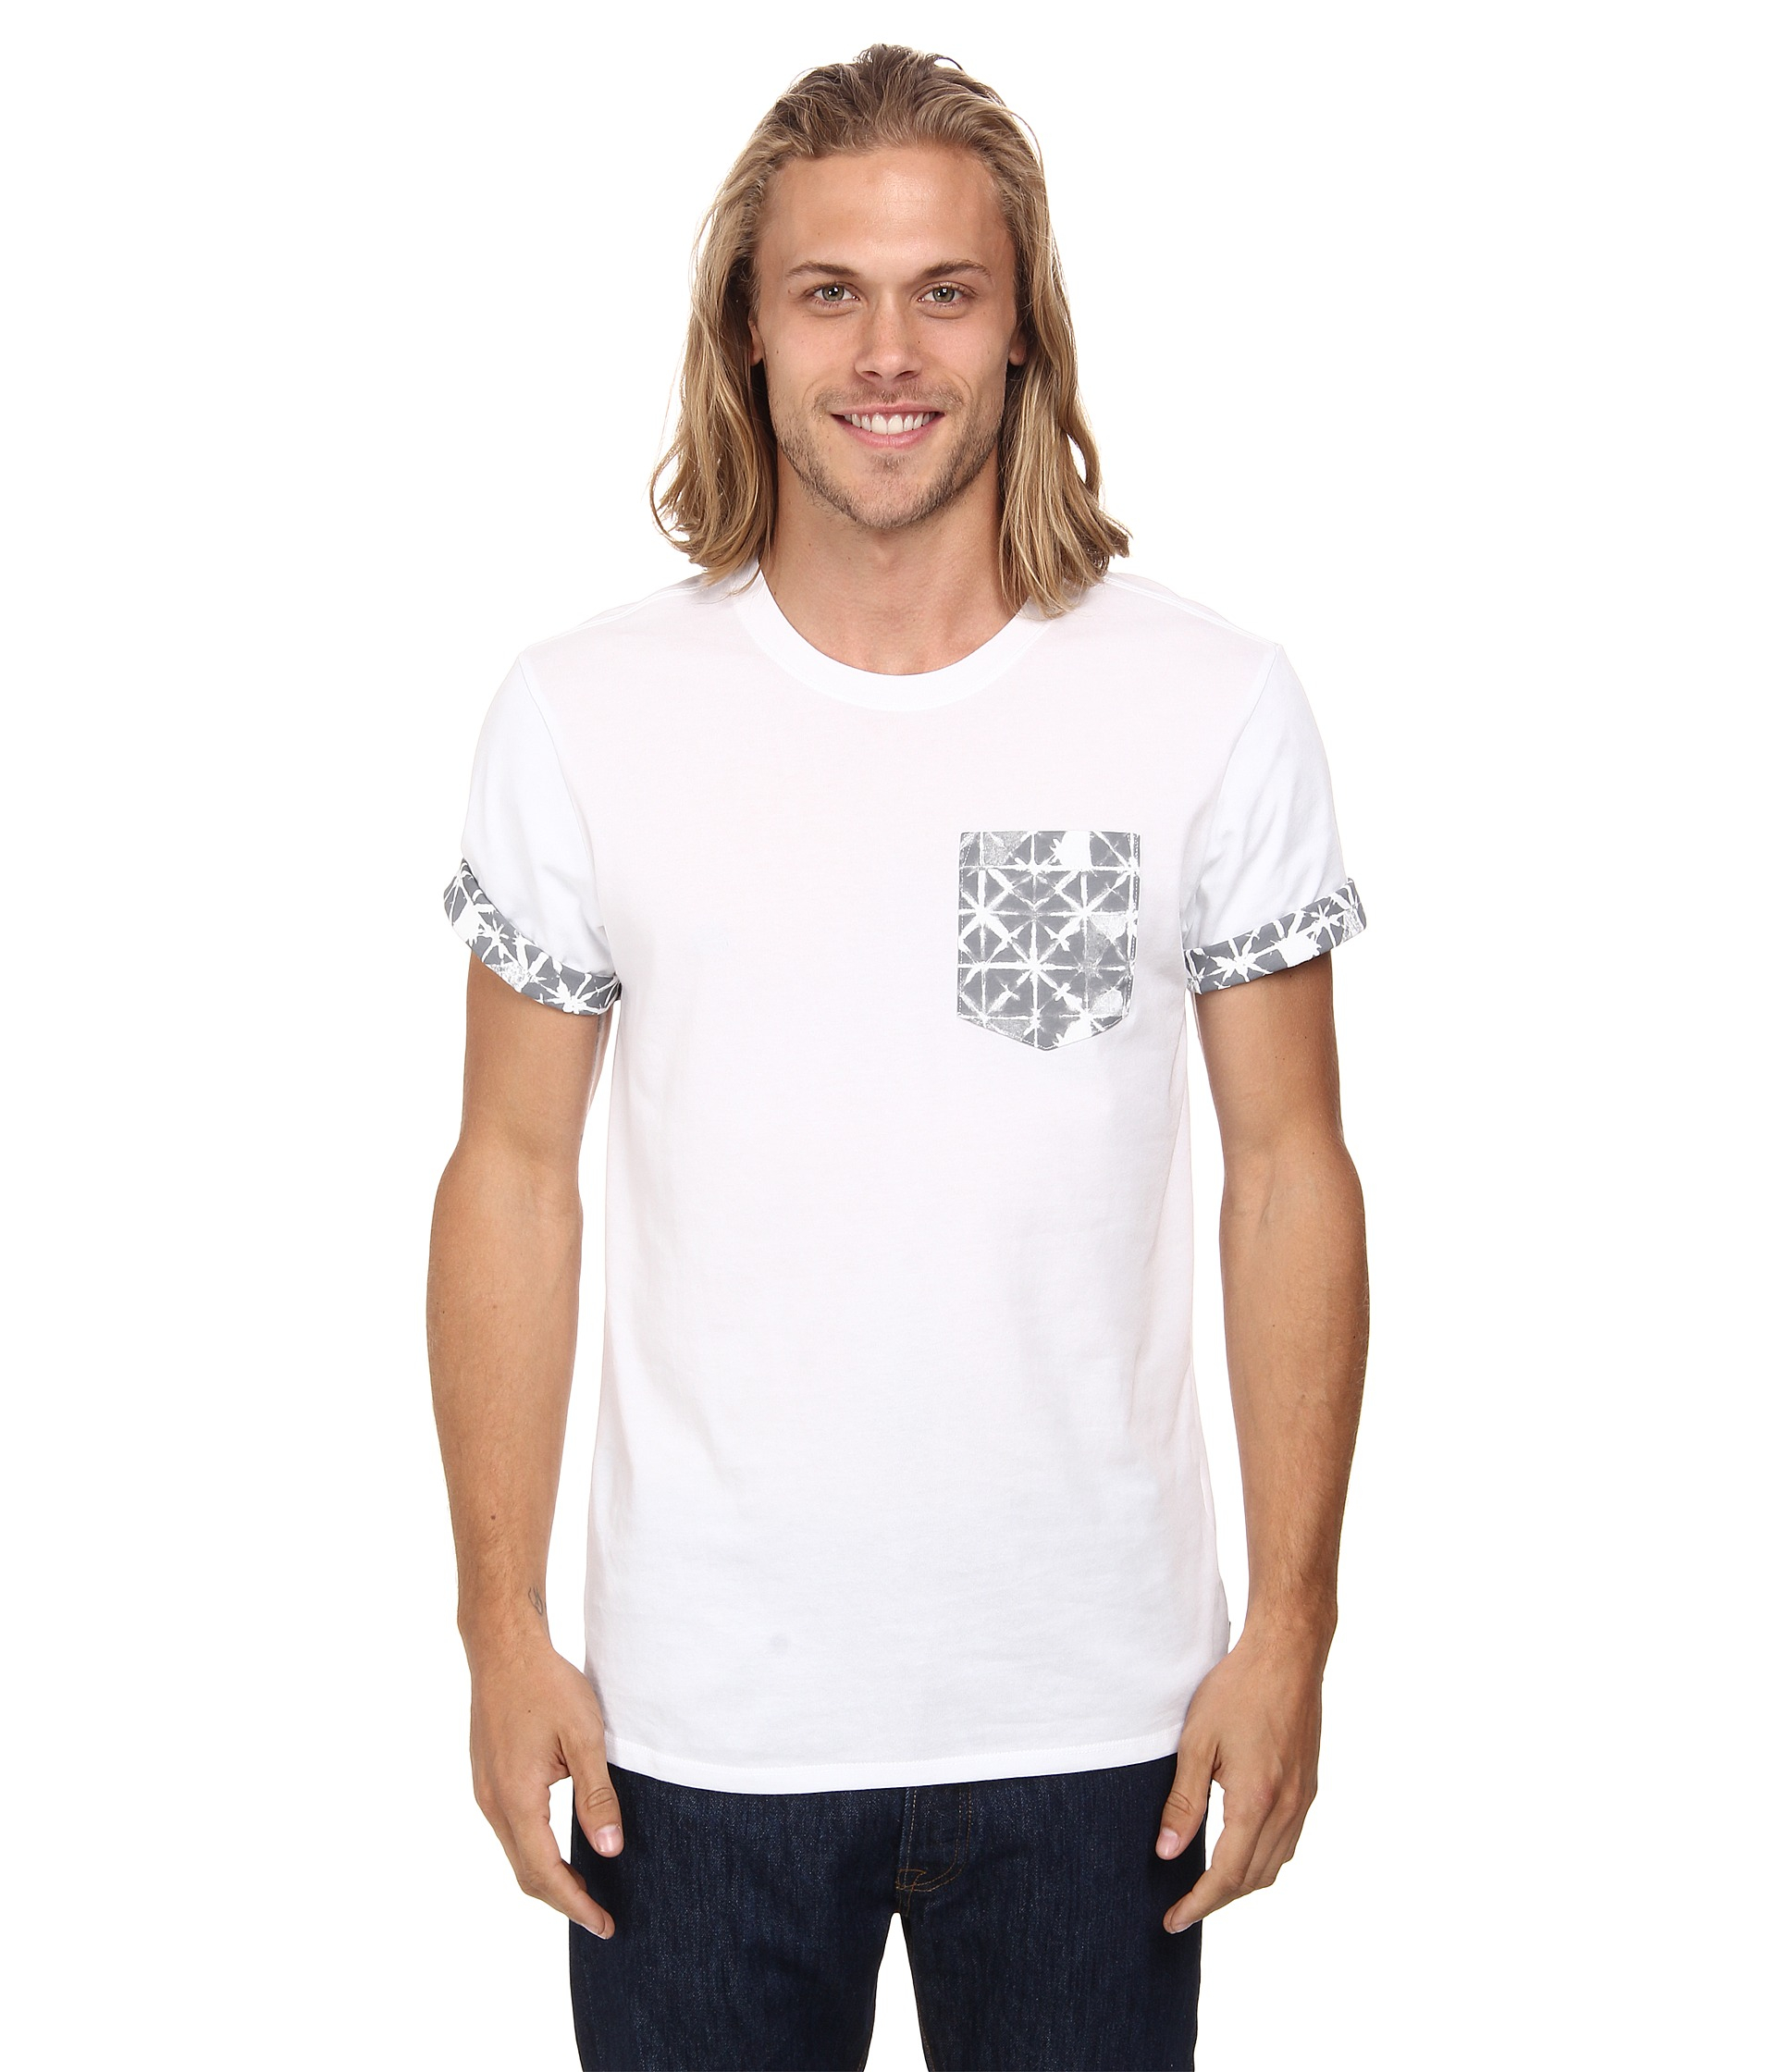 cf6ca653c Nike Dri-fit Sb Geo Dye Pocket Tee in White for Men - Lyst